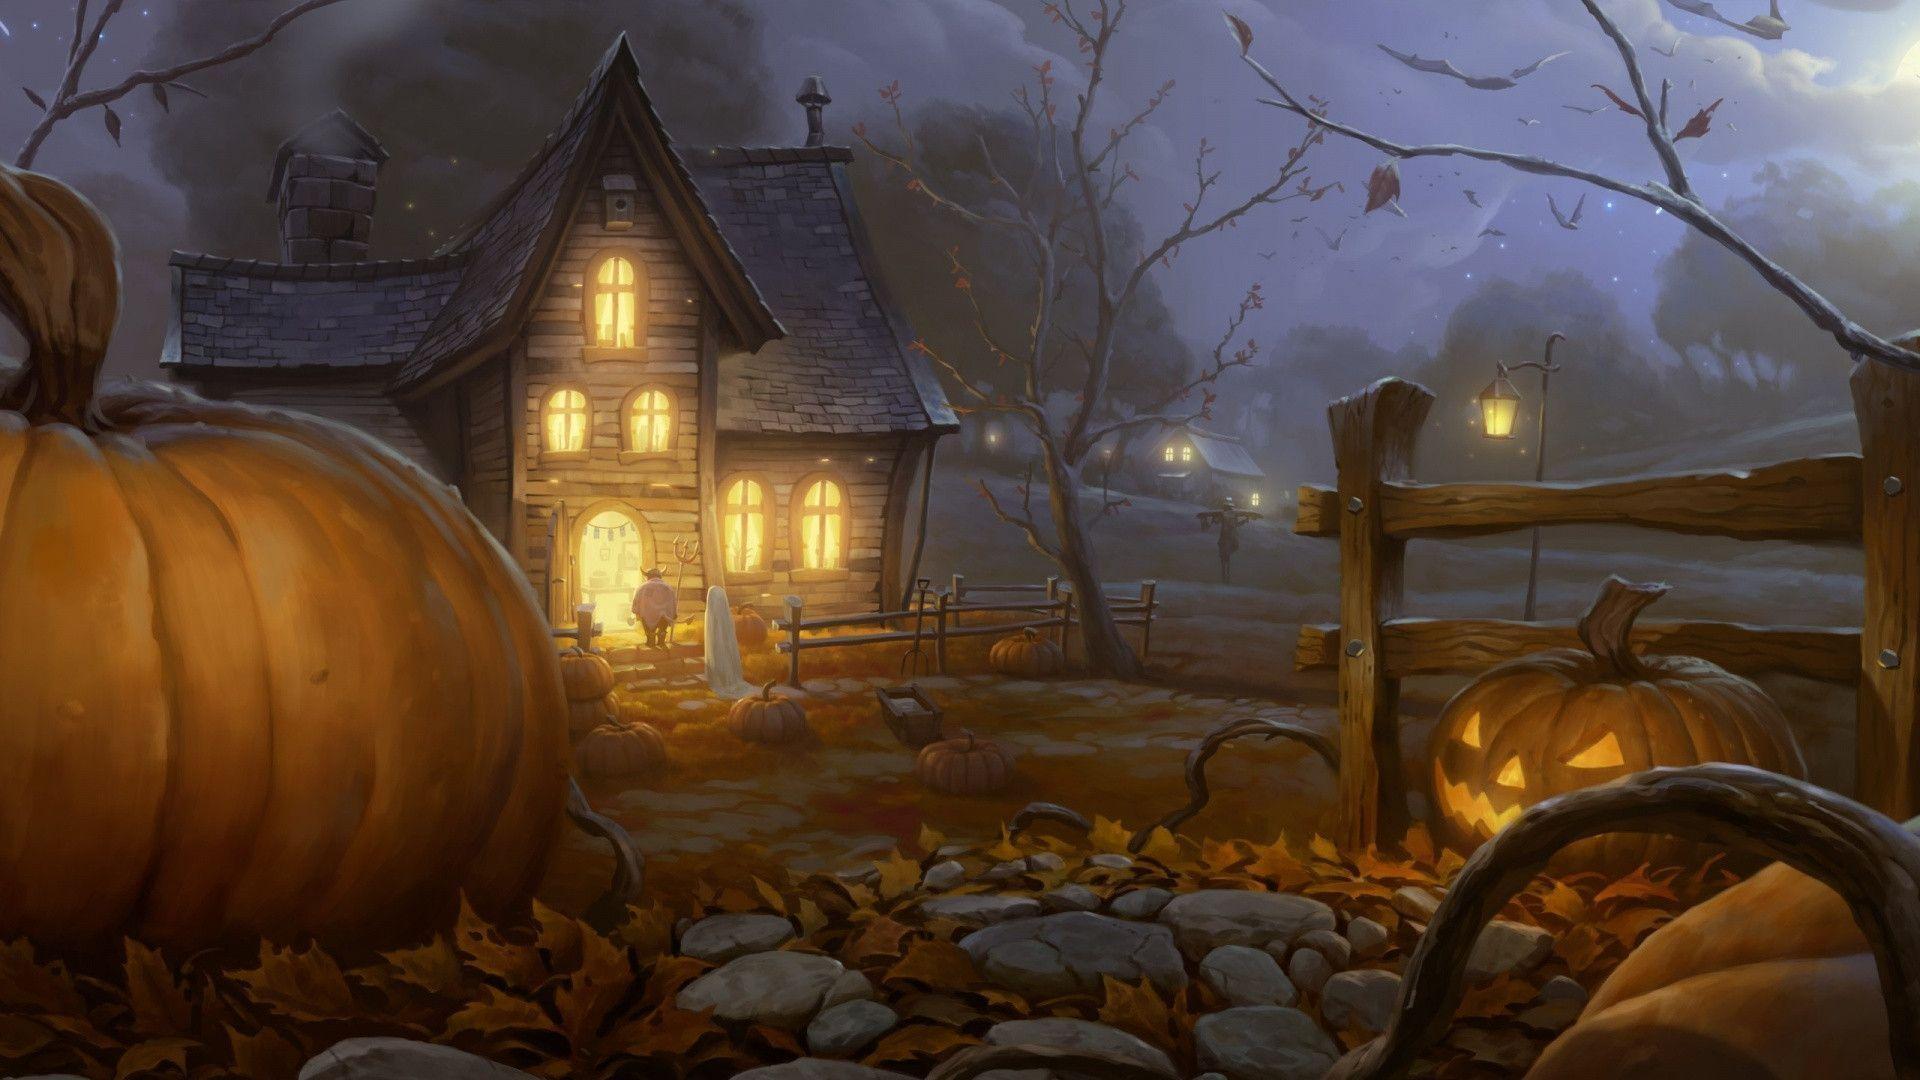 halloween wallpaper 1920x1080